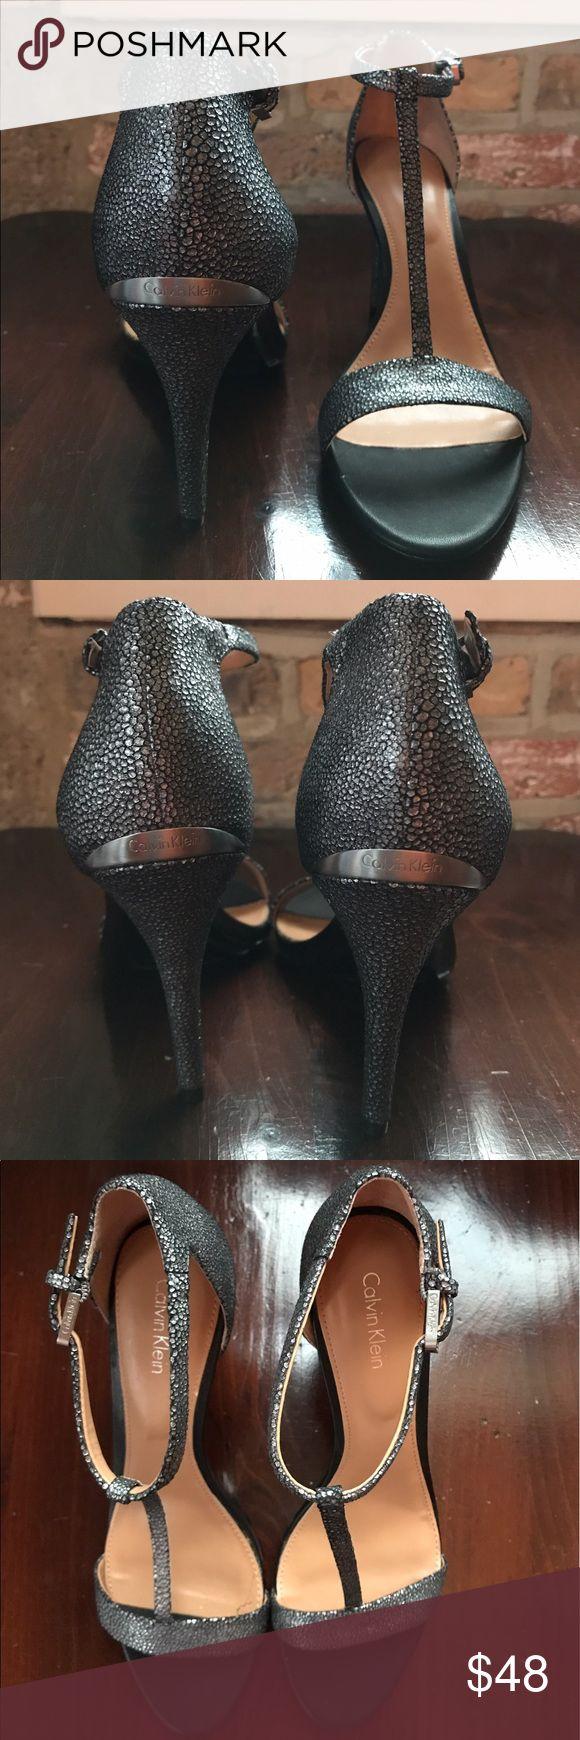 Calvin Klein Heels Sleek Calvin Klein dress sandals. Round toe ankle strap sandals. Adjustable buckle closure. Speckle-like design in silver. 3.75 inch heels. NEVER WORN. Calvin Klein Shoes Heels